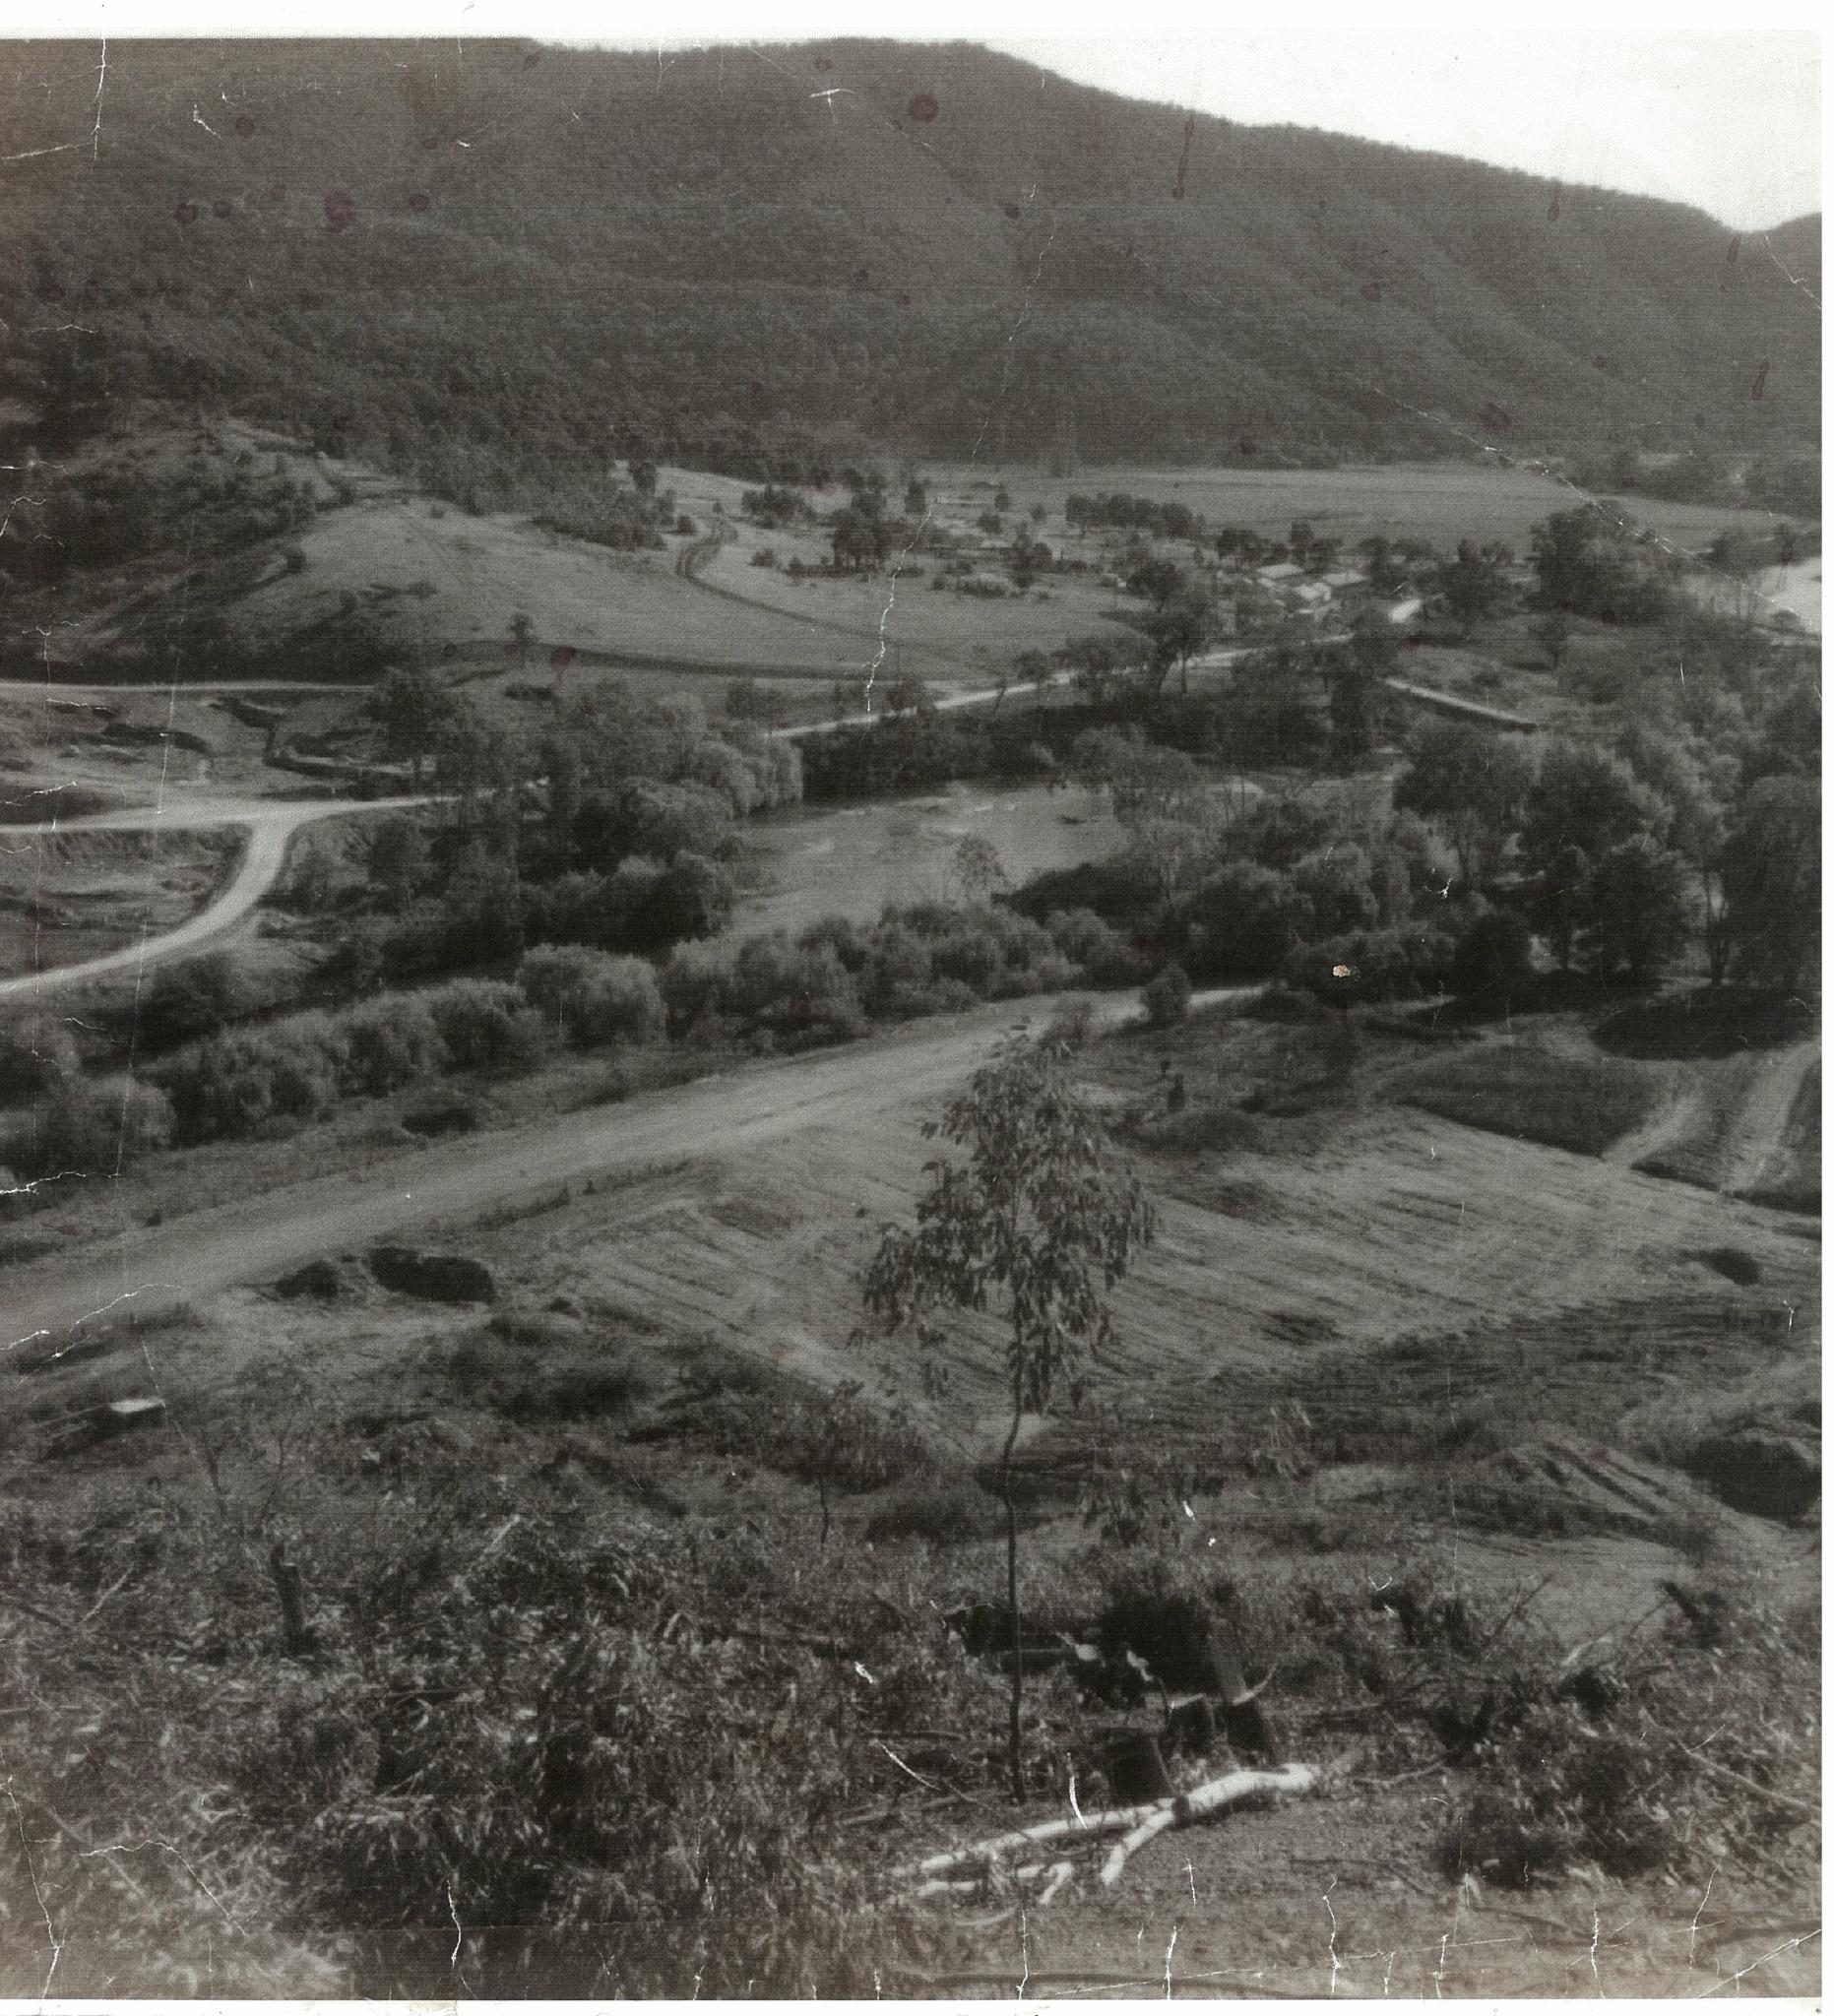 bradymarysflat-chrisnicholes-1964